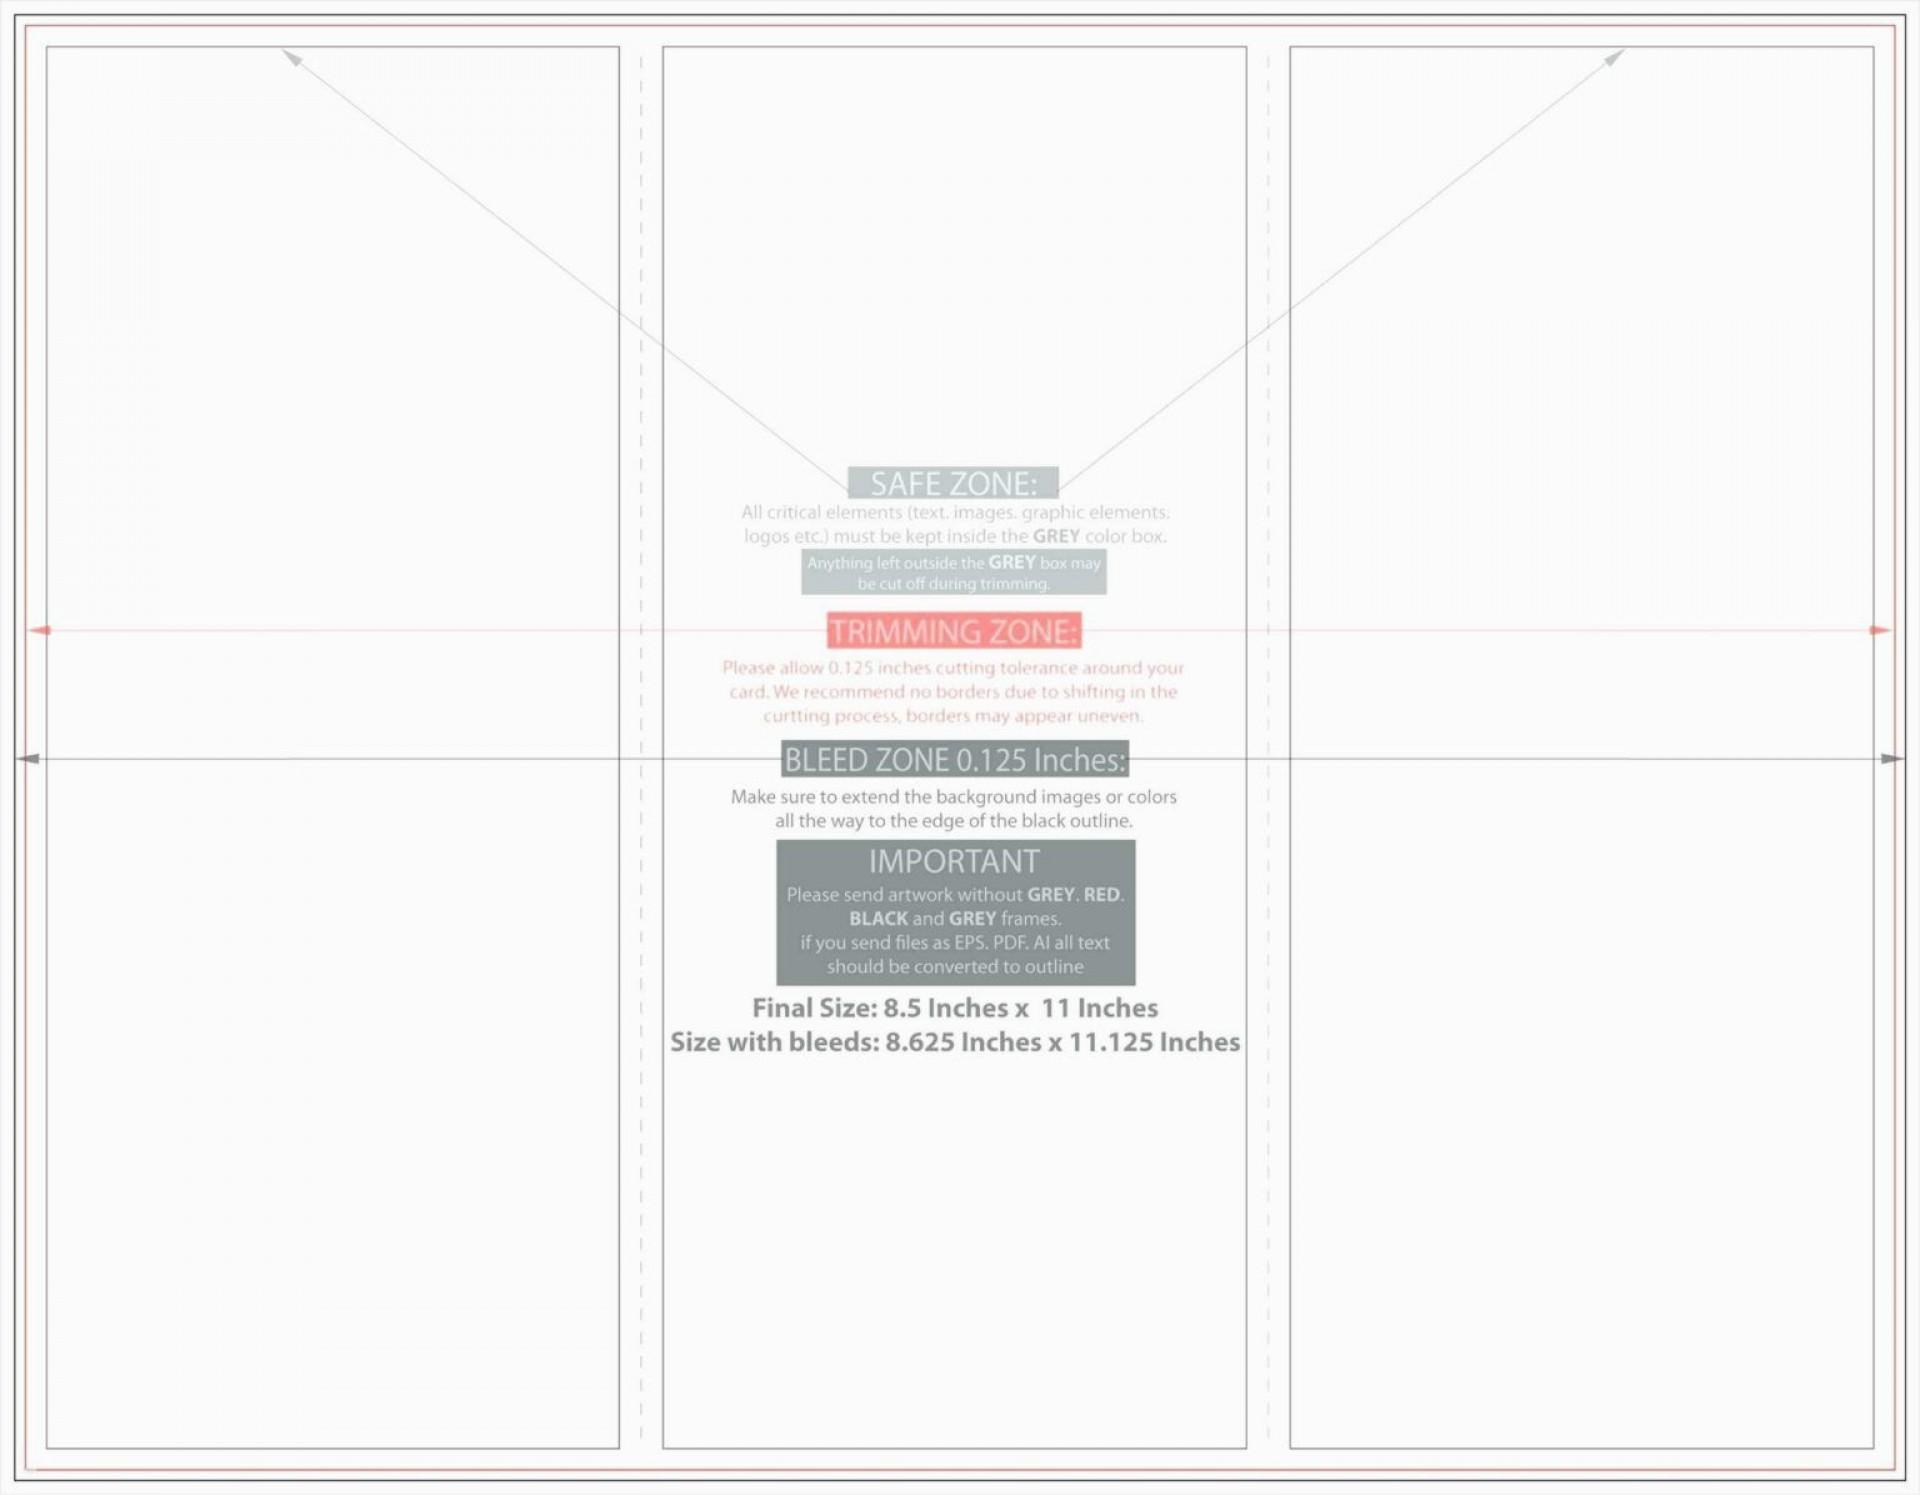 006 Surprising Quarter Fold Card Template Word Blank High Resolution 1920